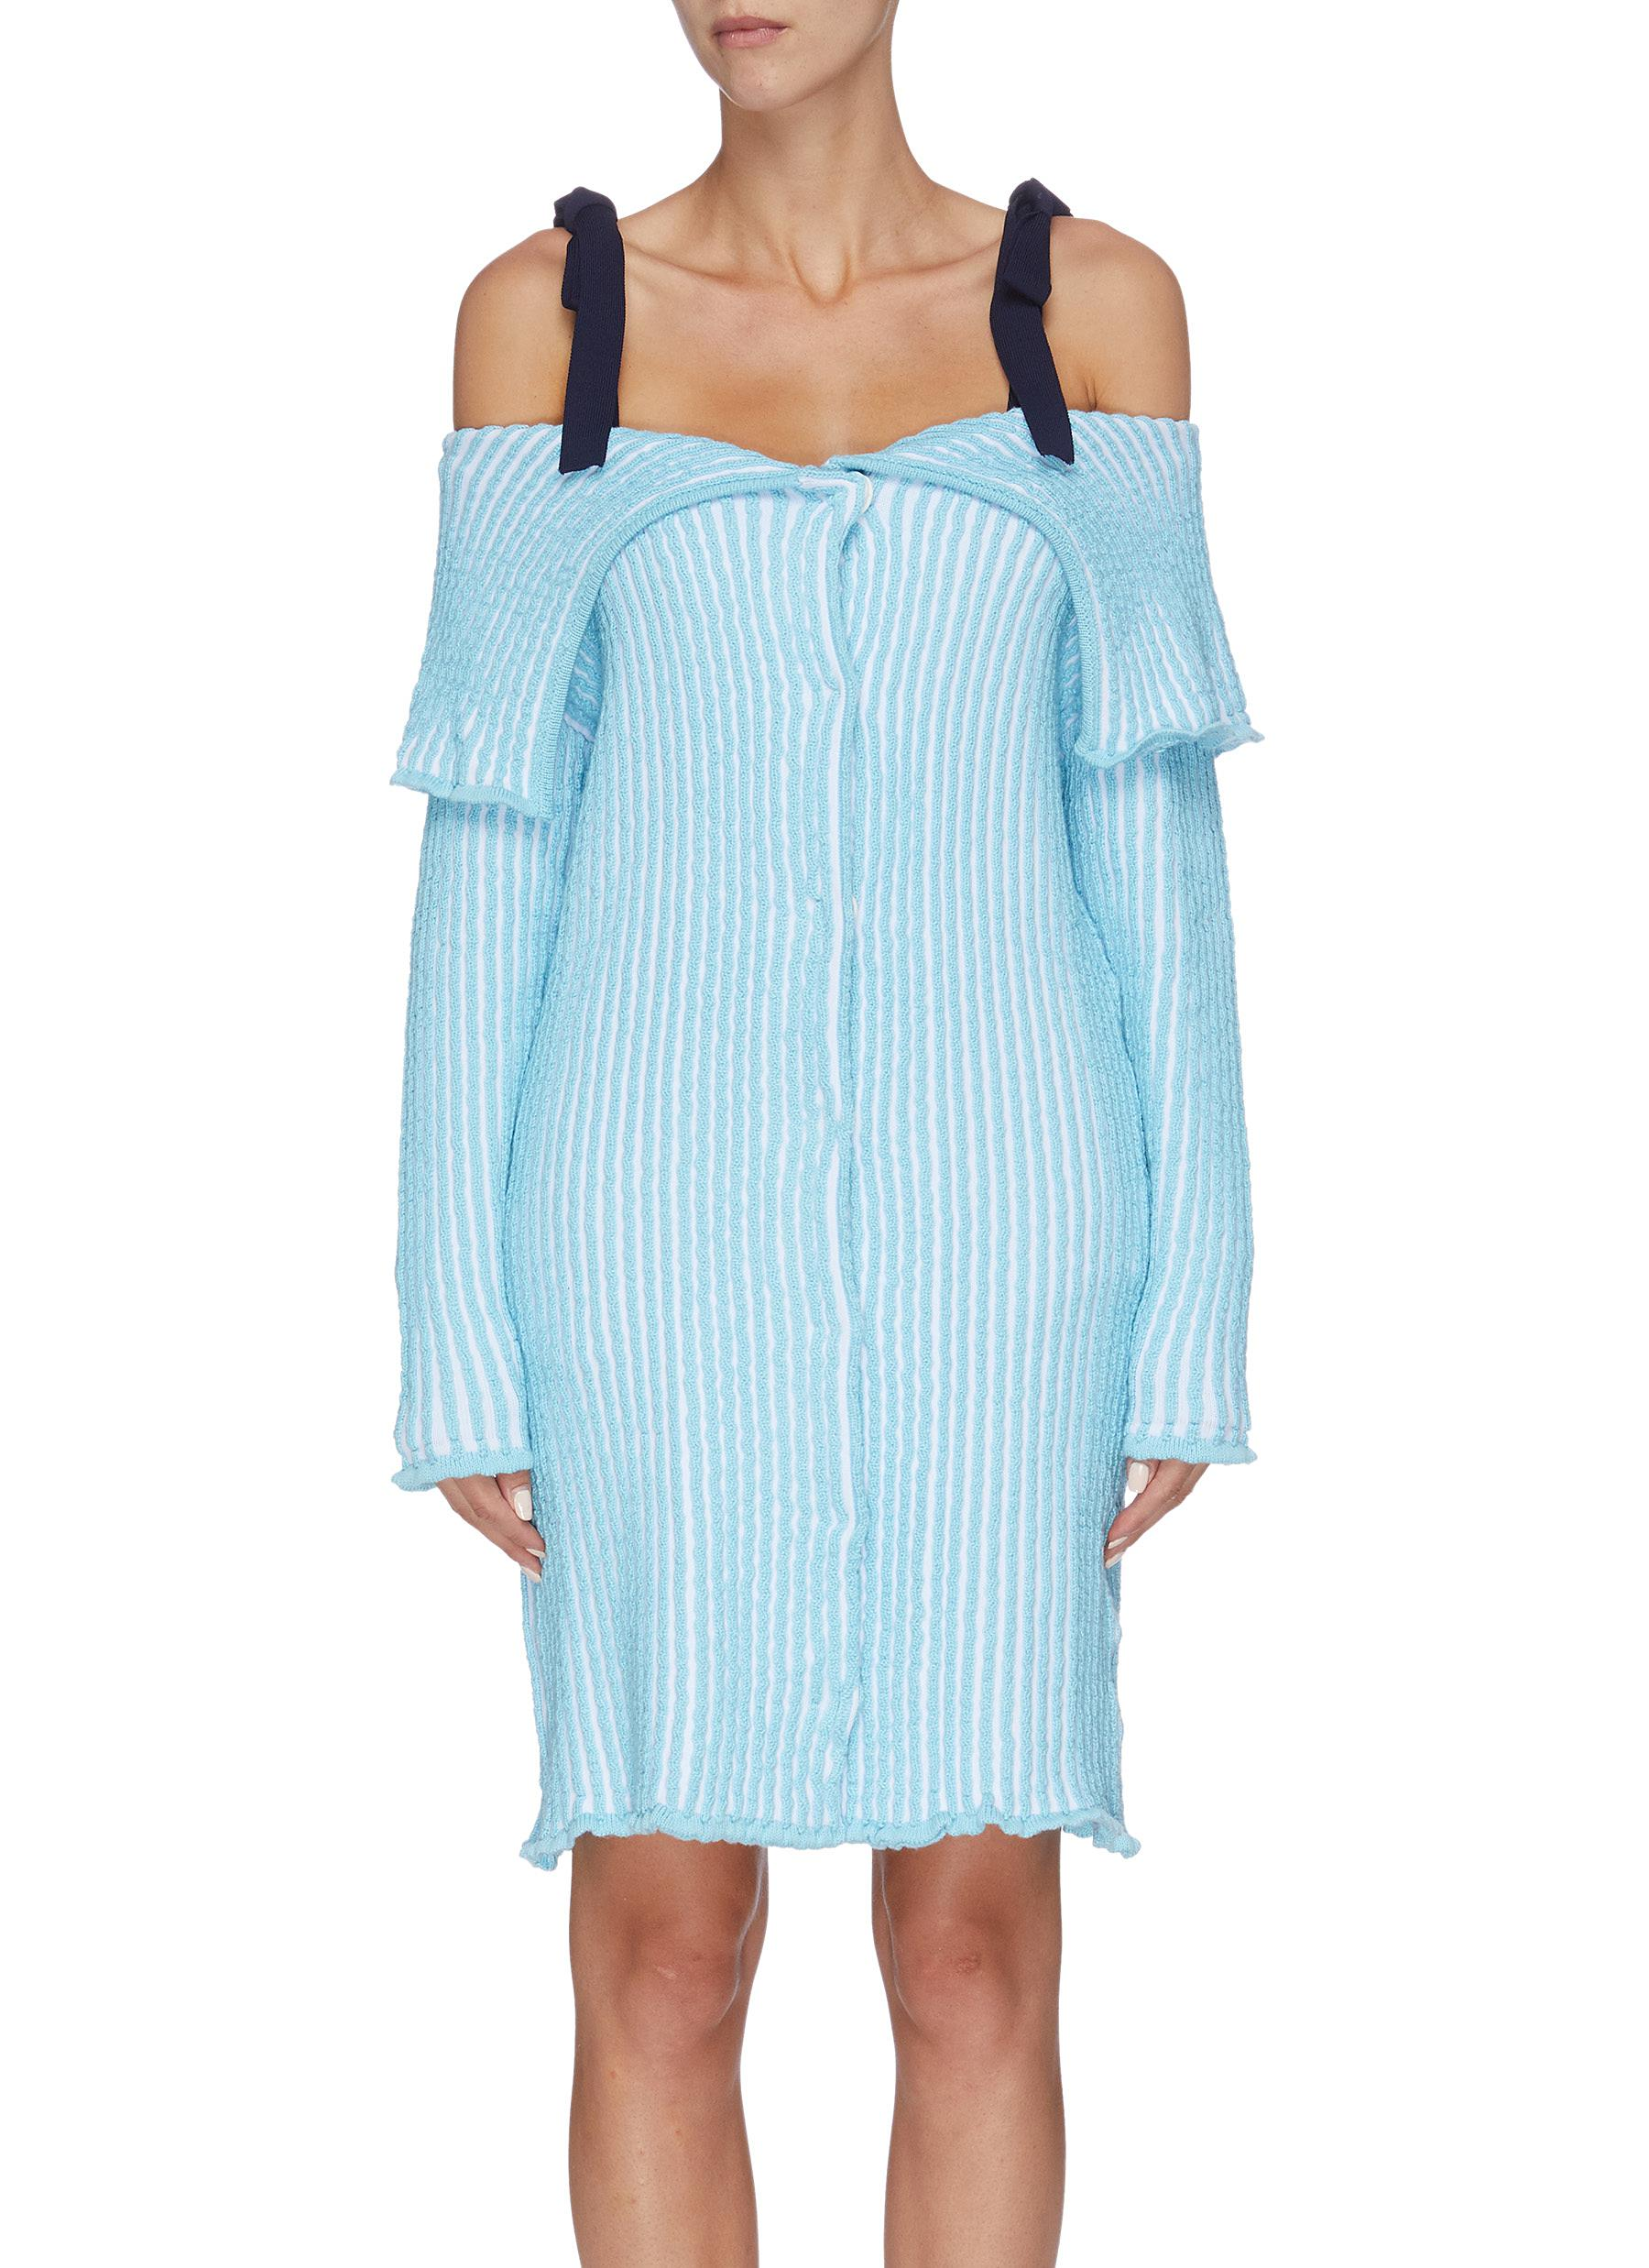 Folded panel stripe cold shoulder knit dress by Ph5